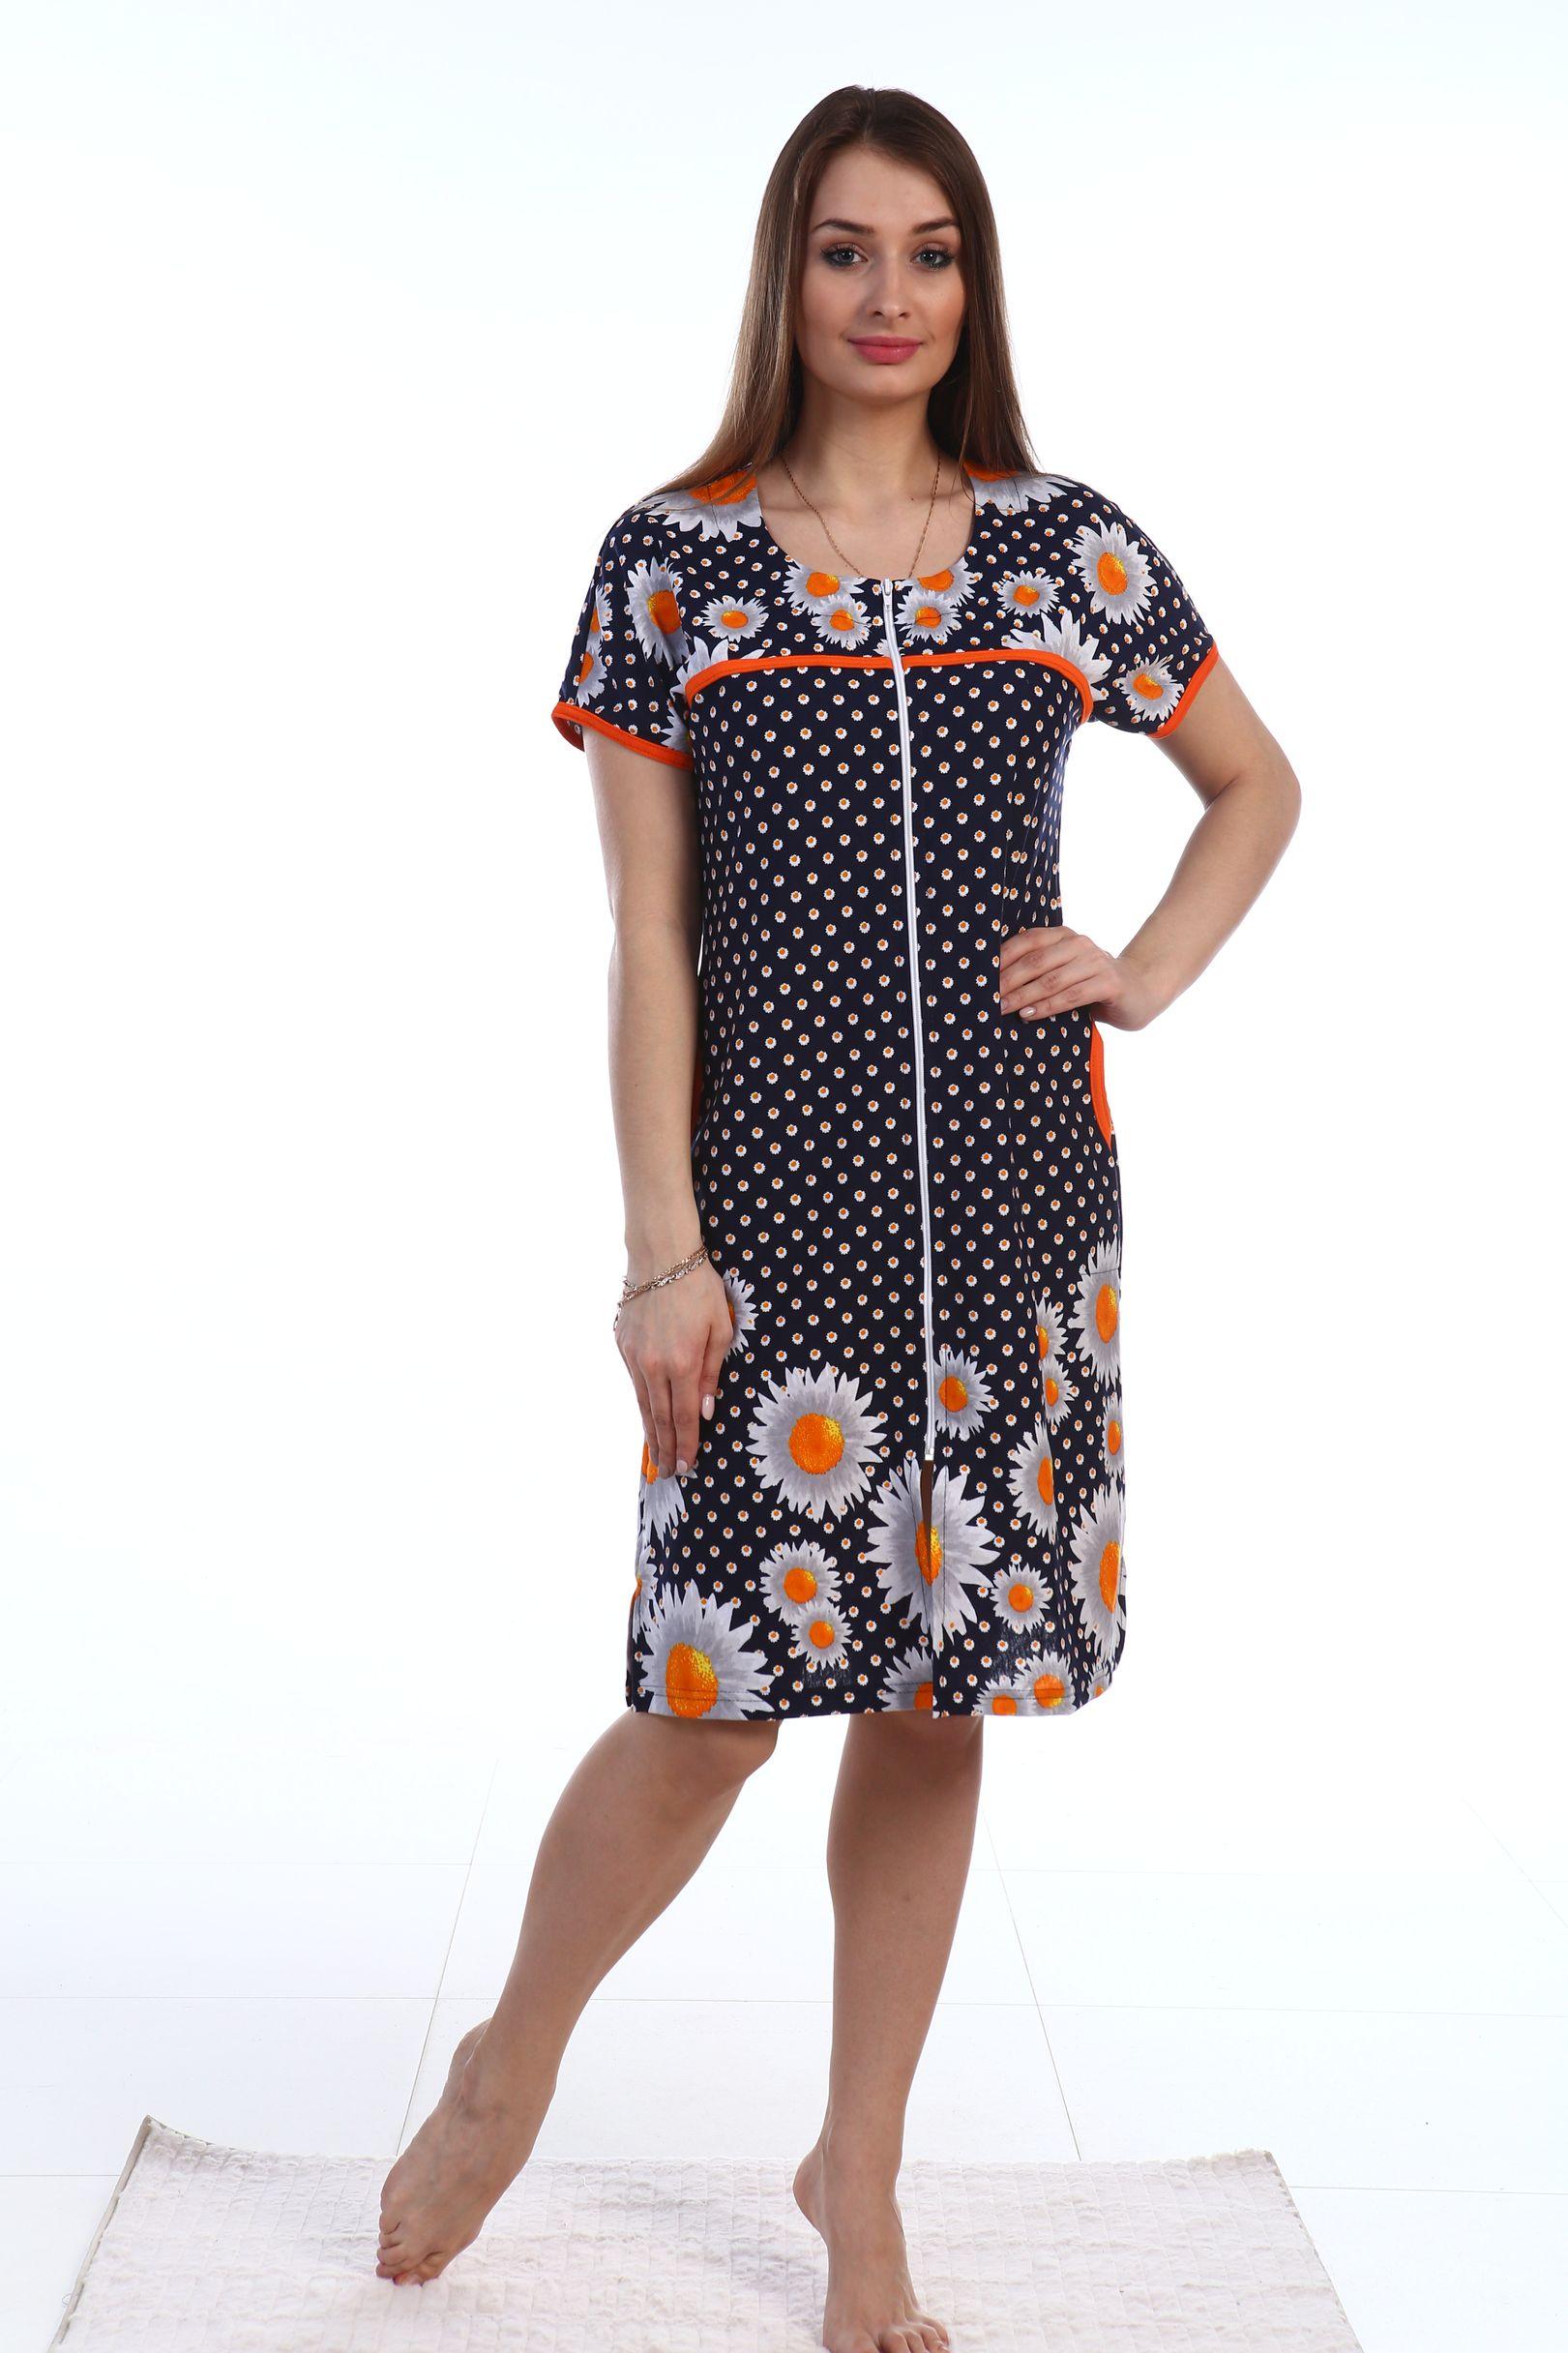 Блузки из трикотажа 2017 доставка